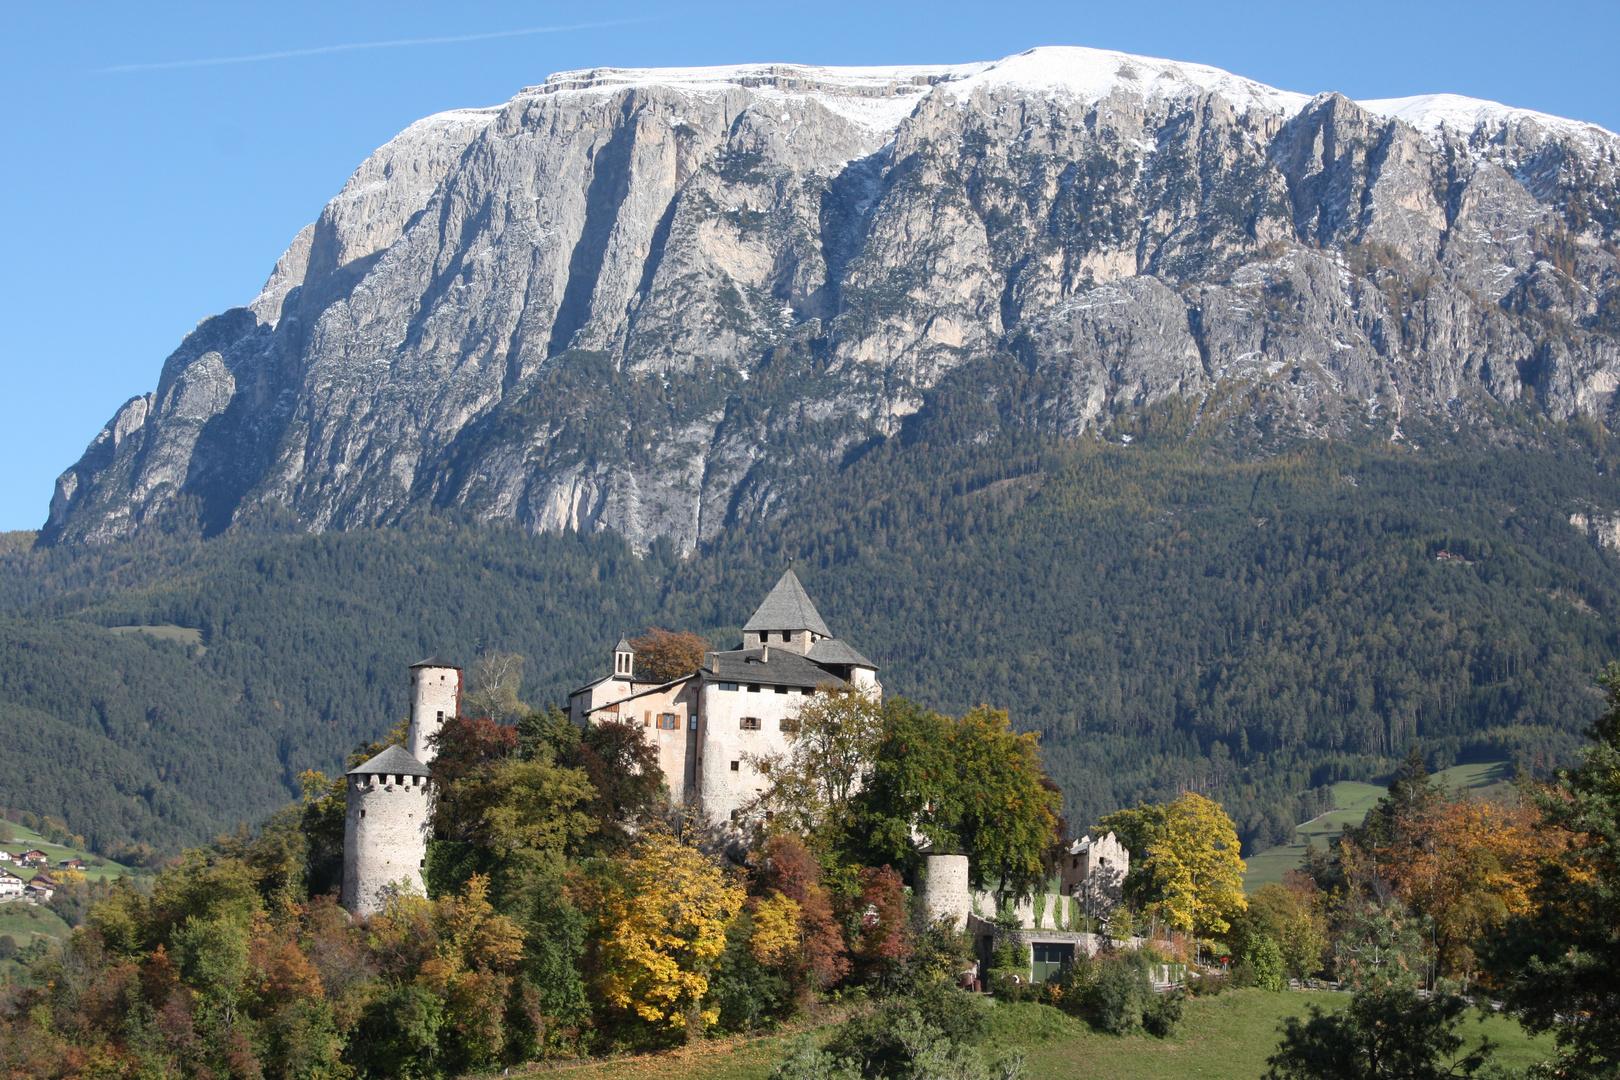 Schloß Prösel in Südtirol